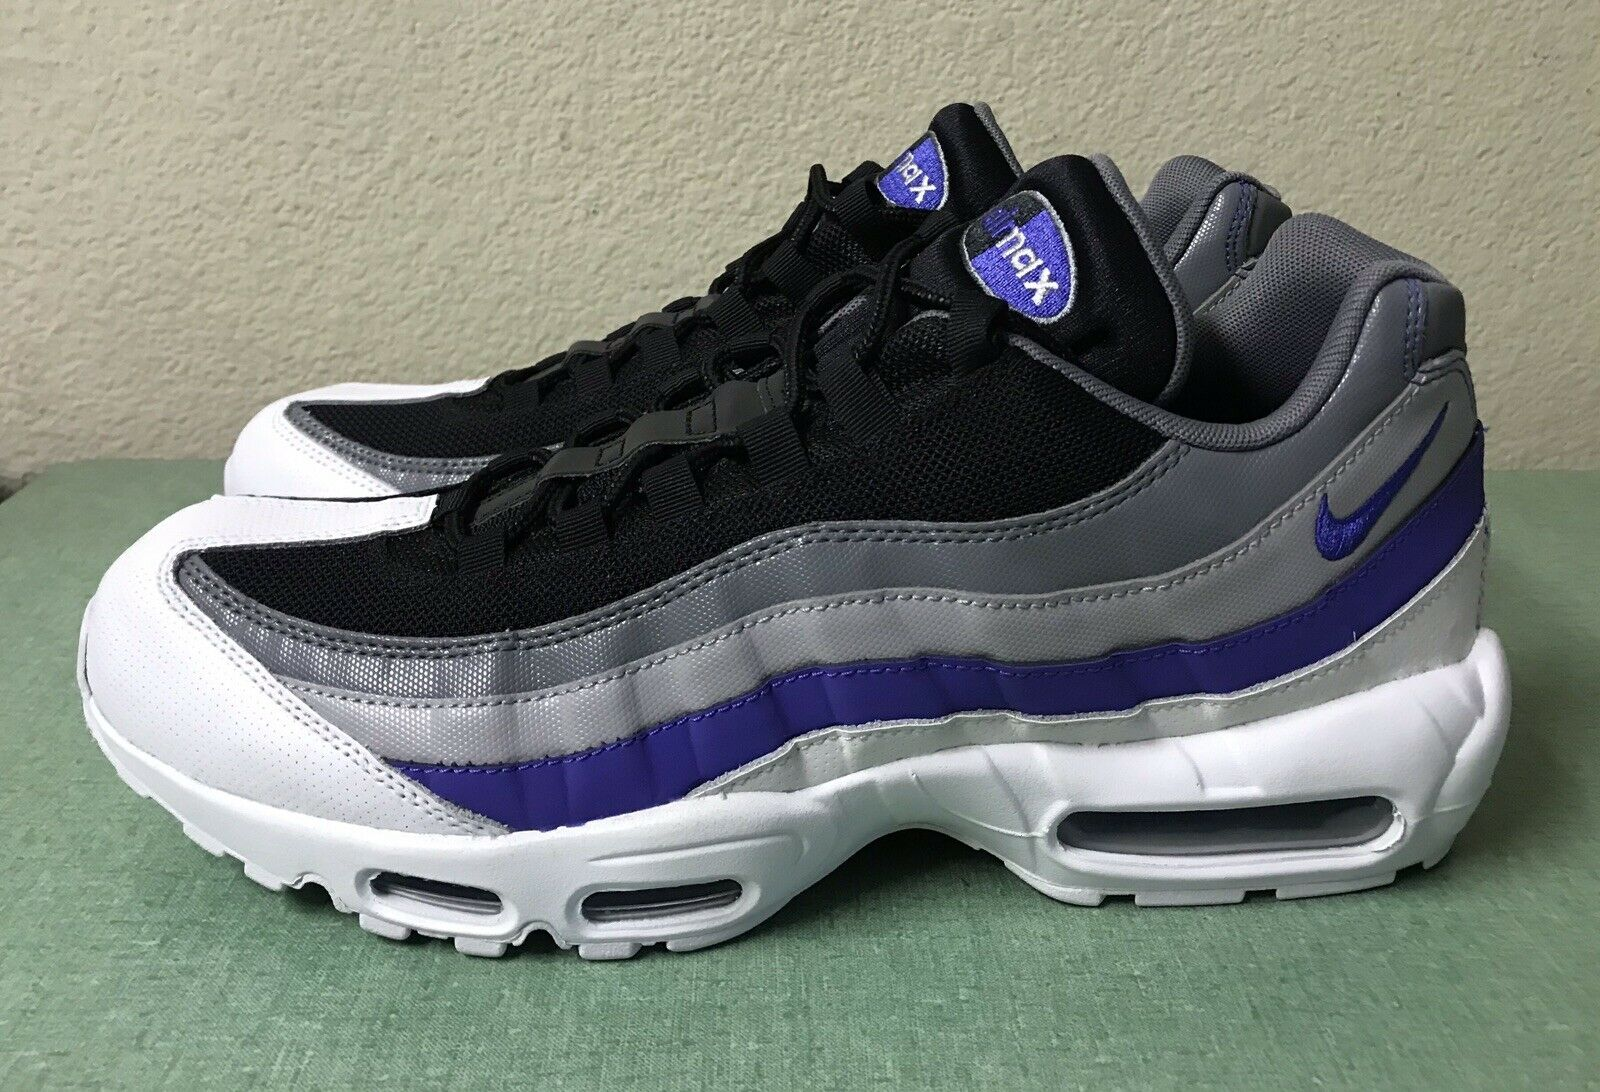 Nike Air Max 95 Essential White Persian purple Cool Grey Black Mens Sz 12 NEW